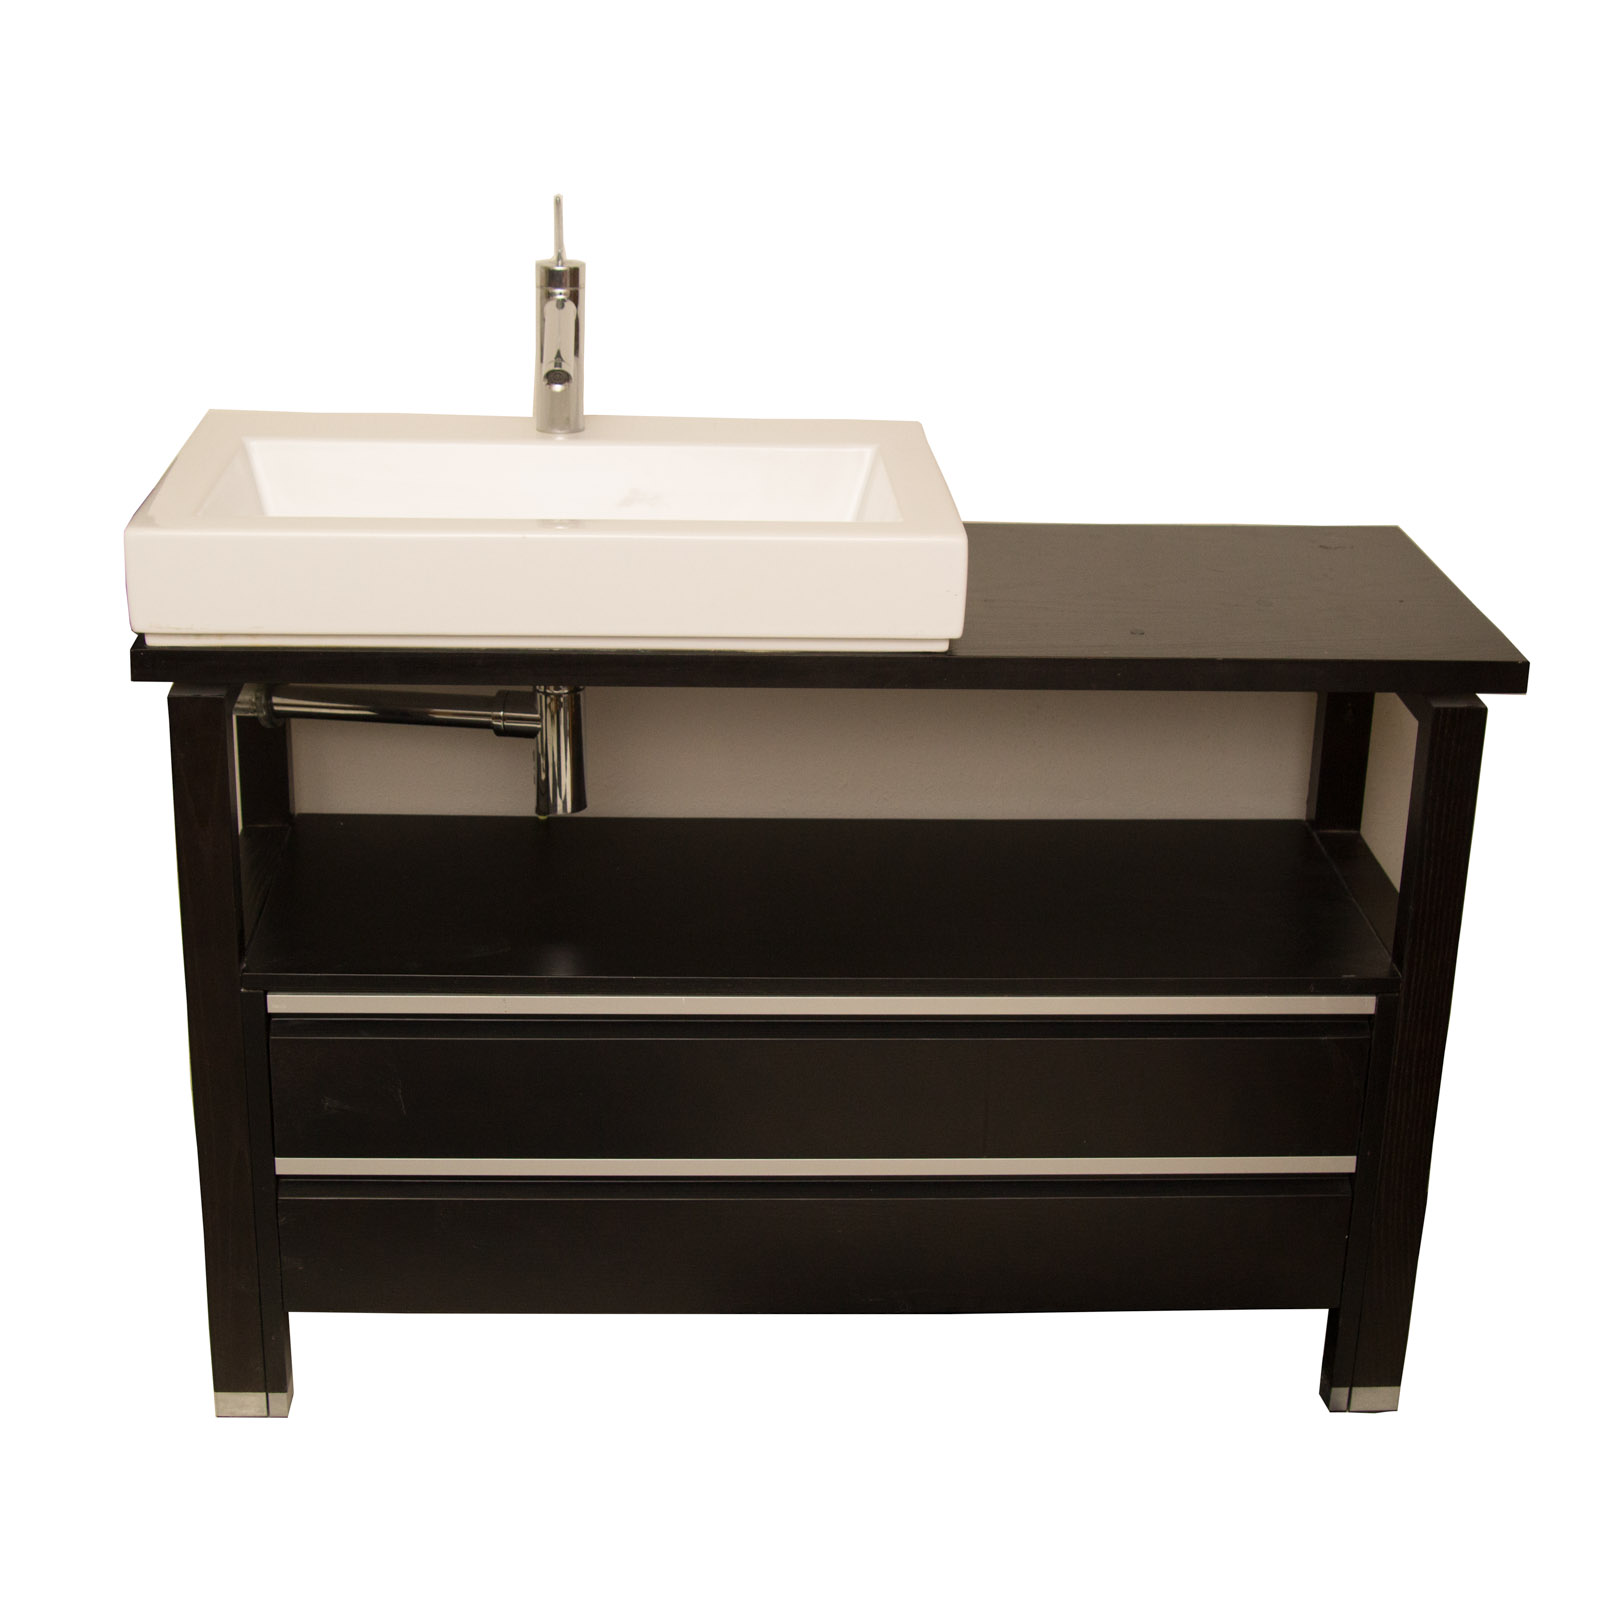 bathroom vanities cincinnati. Hansgrohe Axor Sink With Wooden Vanity Bathroom Vanities Cincinnati O